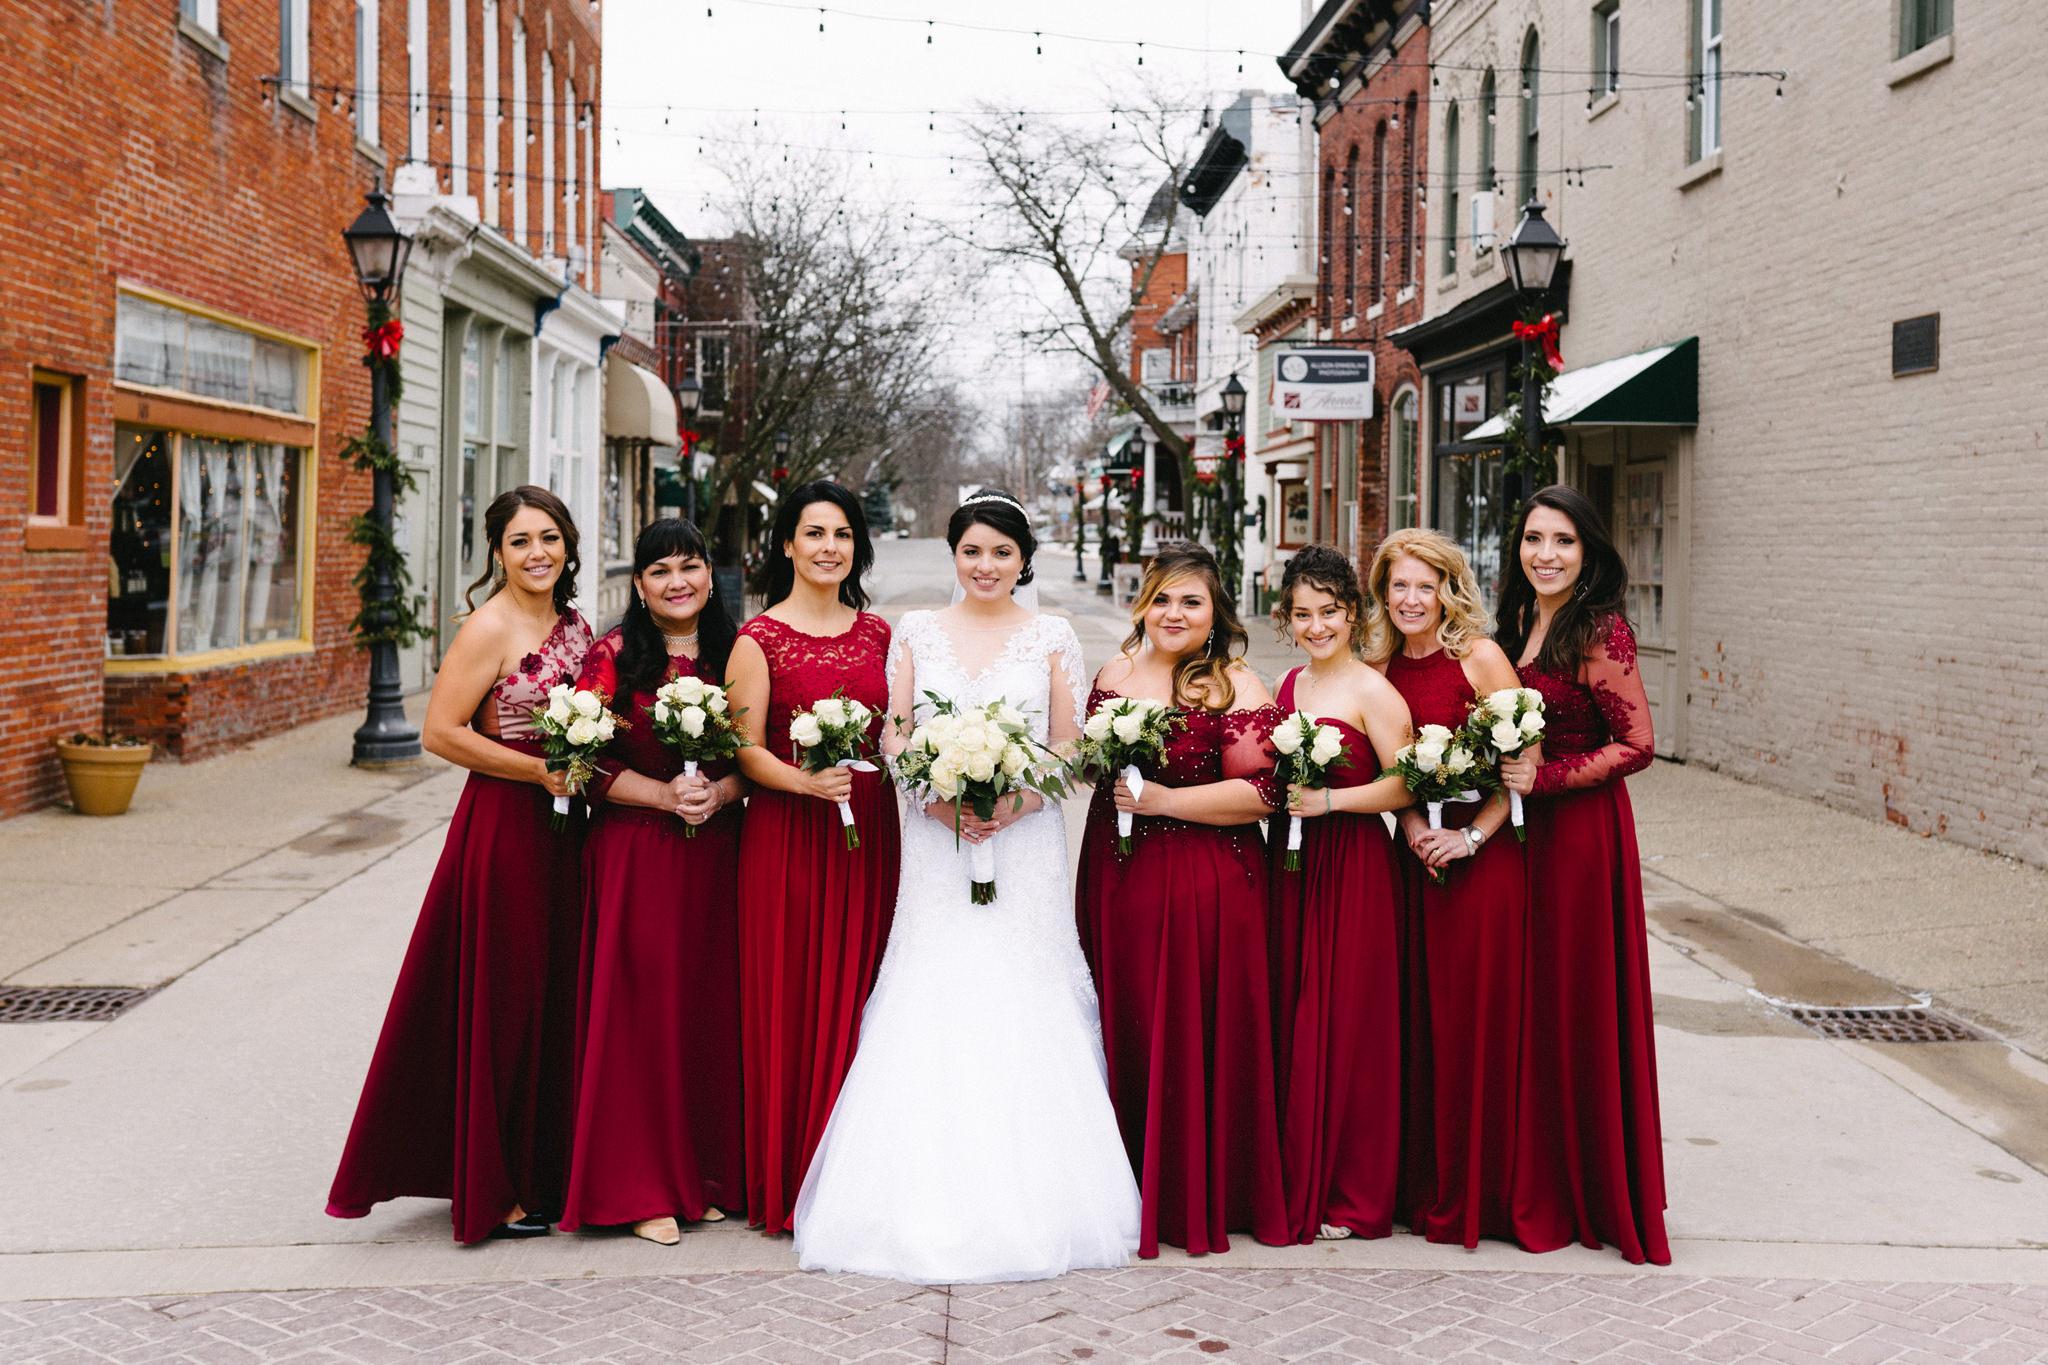 031-rempel-photography-chicago-wedding-inspiration-susan-daniel-michigan-metro-detroit-christian-church-holly-vault-cupcakes-and-kisses.jpg